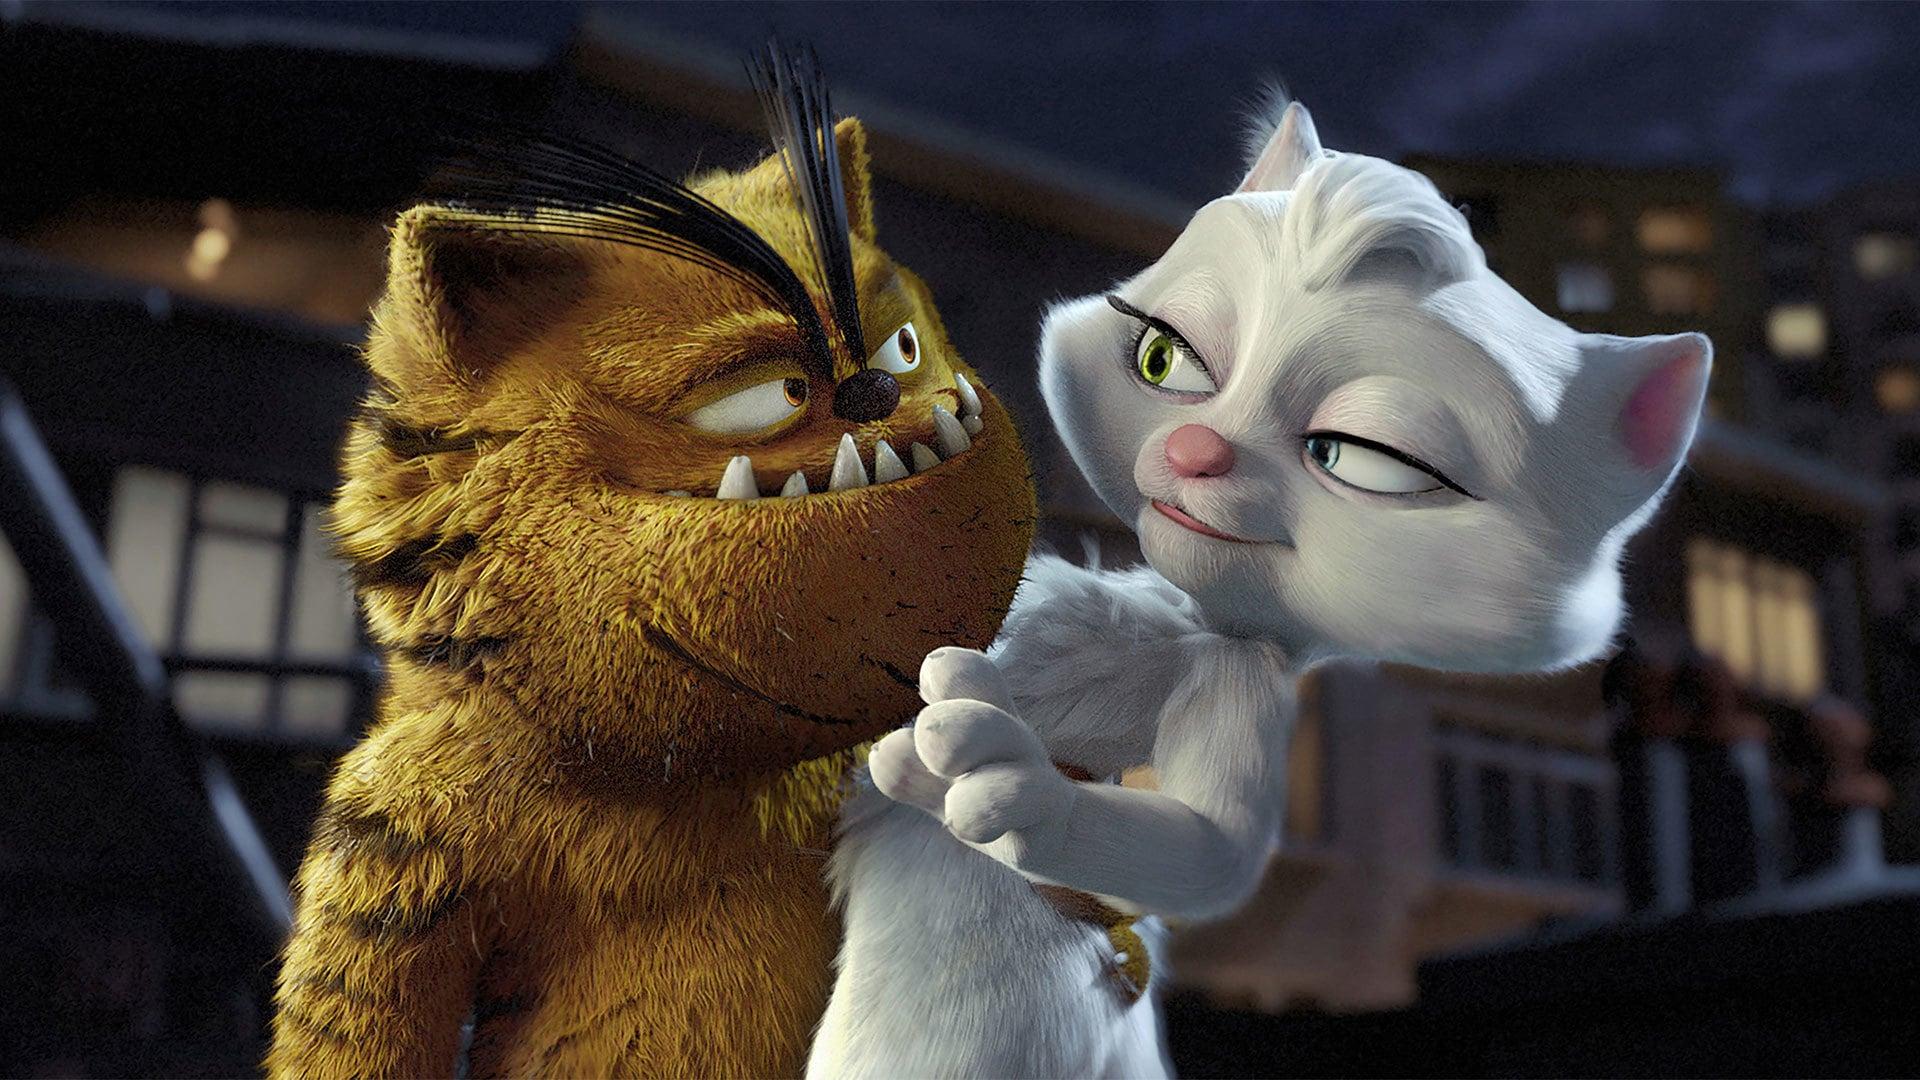 Regarder Bad Cat en streaming gratuit